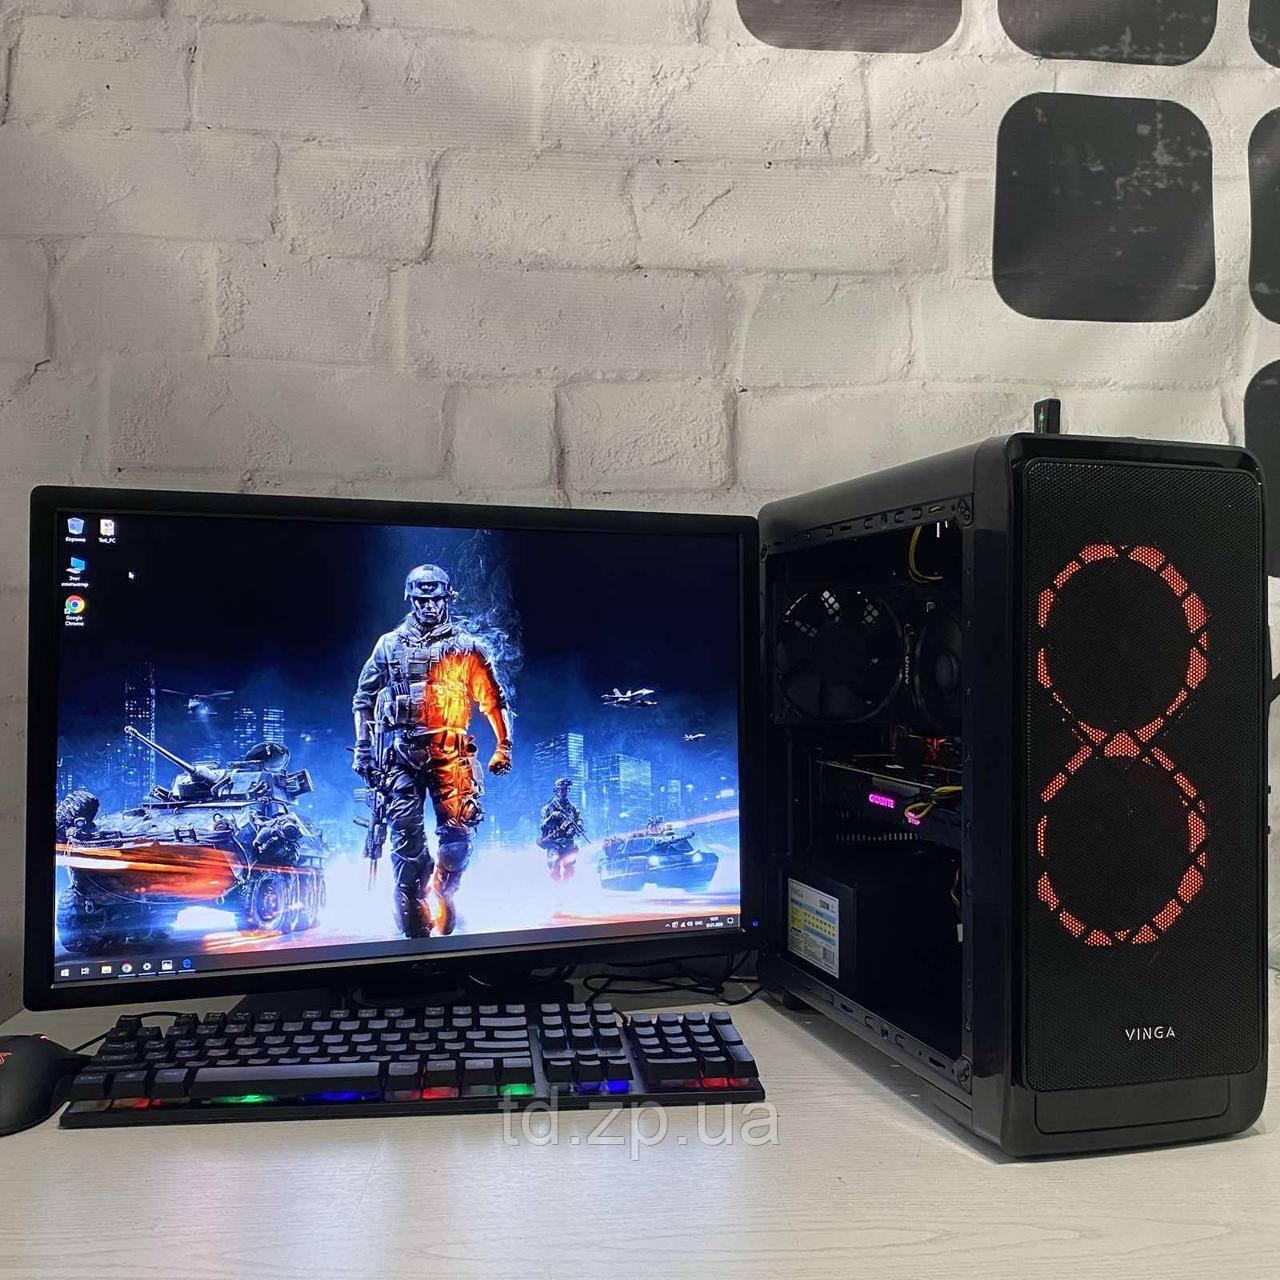 Игровой компьютер Intel Core i3-9100f + NVIDIA GTX 1060 3Gb + RAM 16Gb + HDD 1000Gb